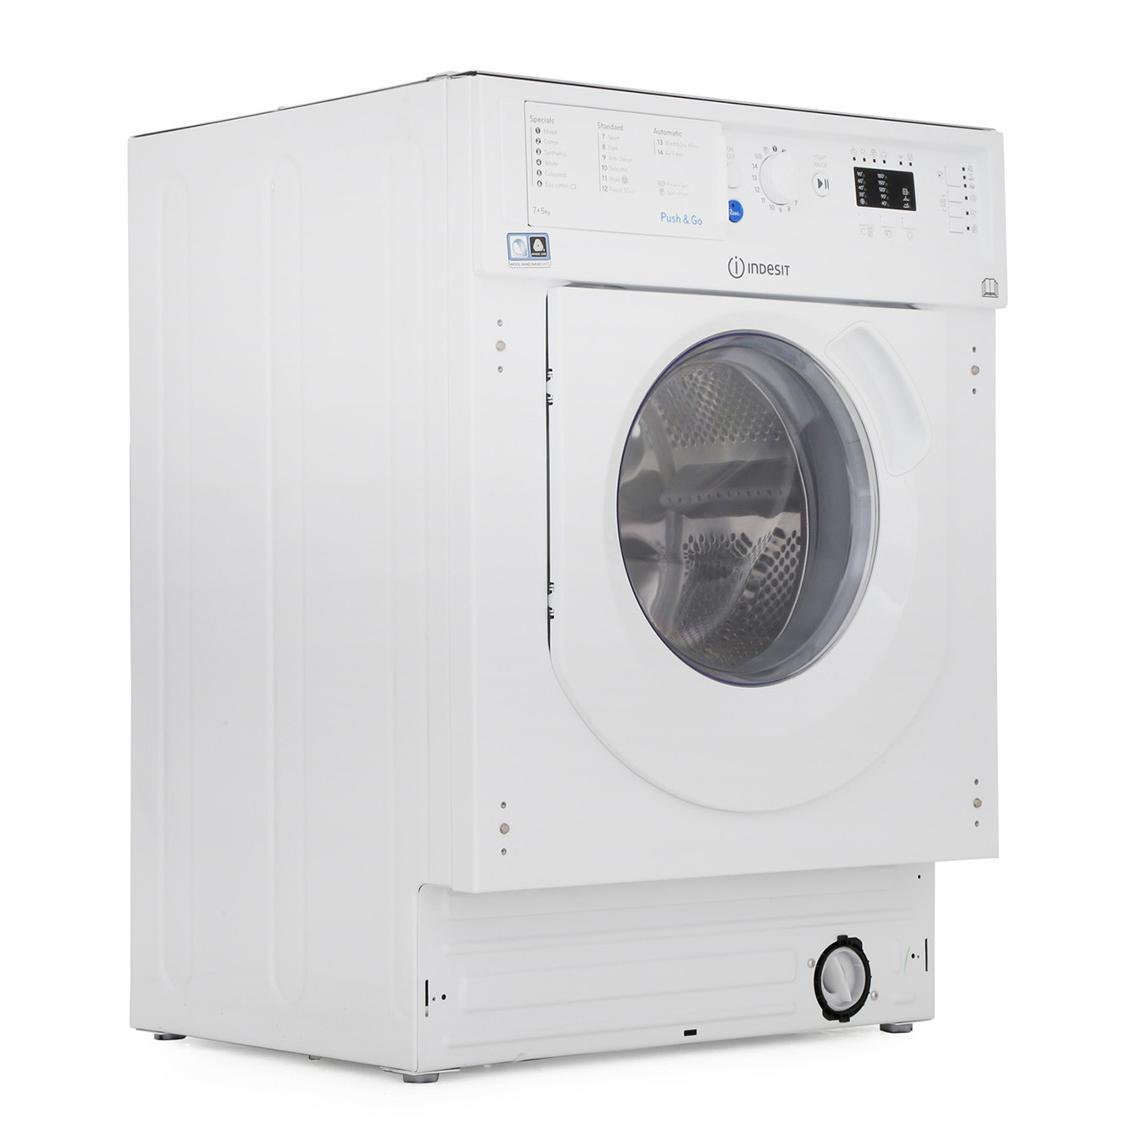 Indesit BI WDIL 7125 UK Integrated Washer Dryer